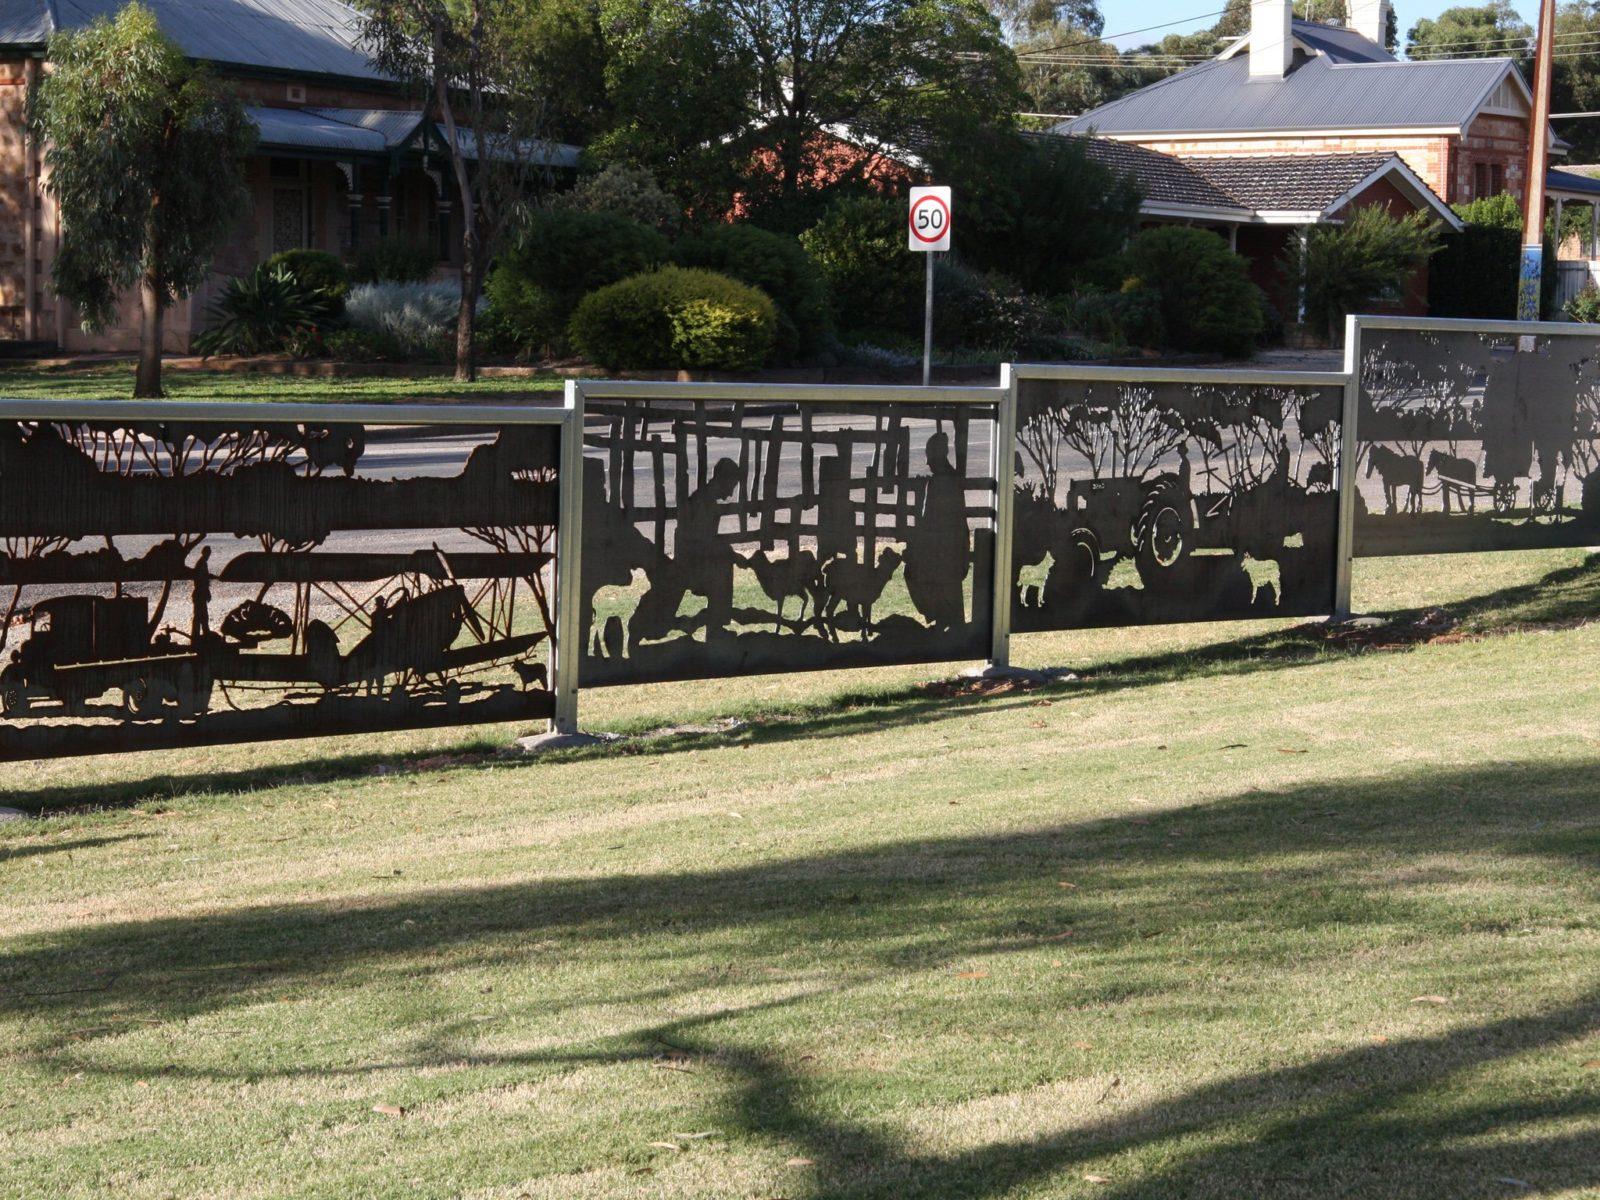 Padnaindi Reserve, Blyth, South Australia. Farming, A Way Of Life - A Common Thread